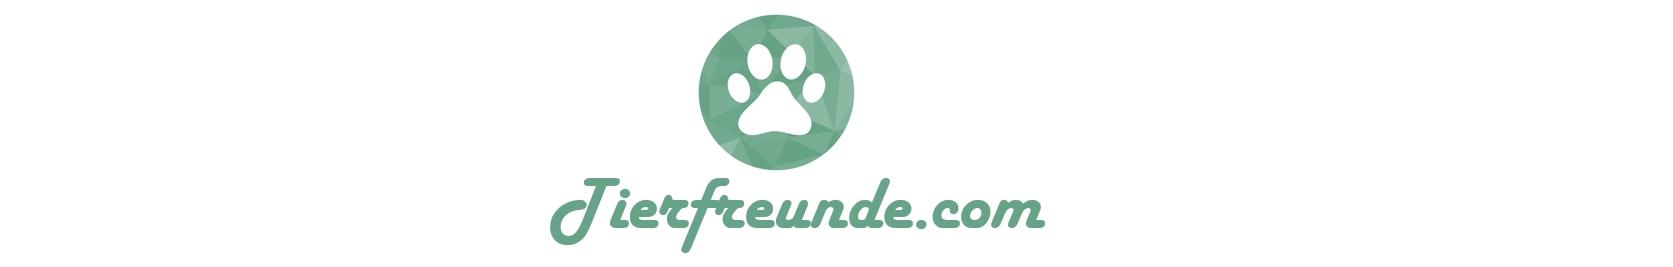 tierfreunde.com